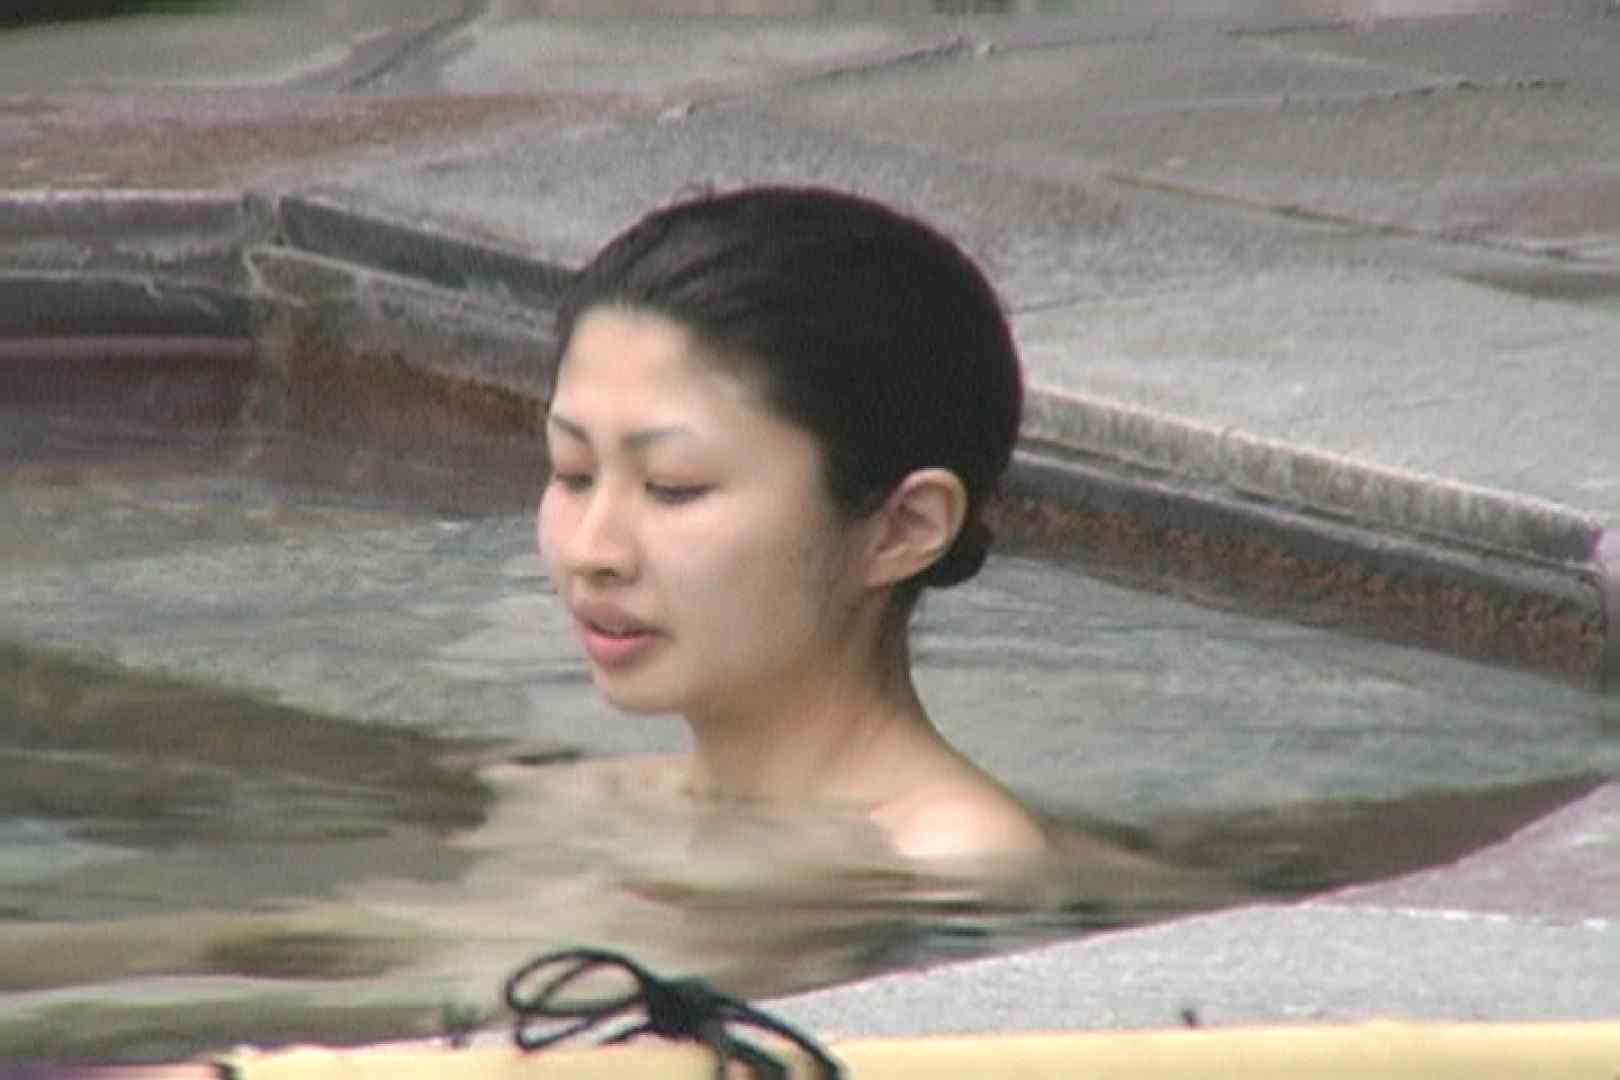 Aquaな露天風呂Vol.642 盗撮シリーズ   露天風呂編  92PIX 1